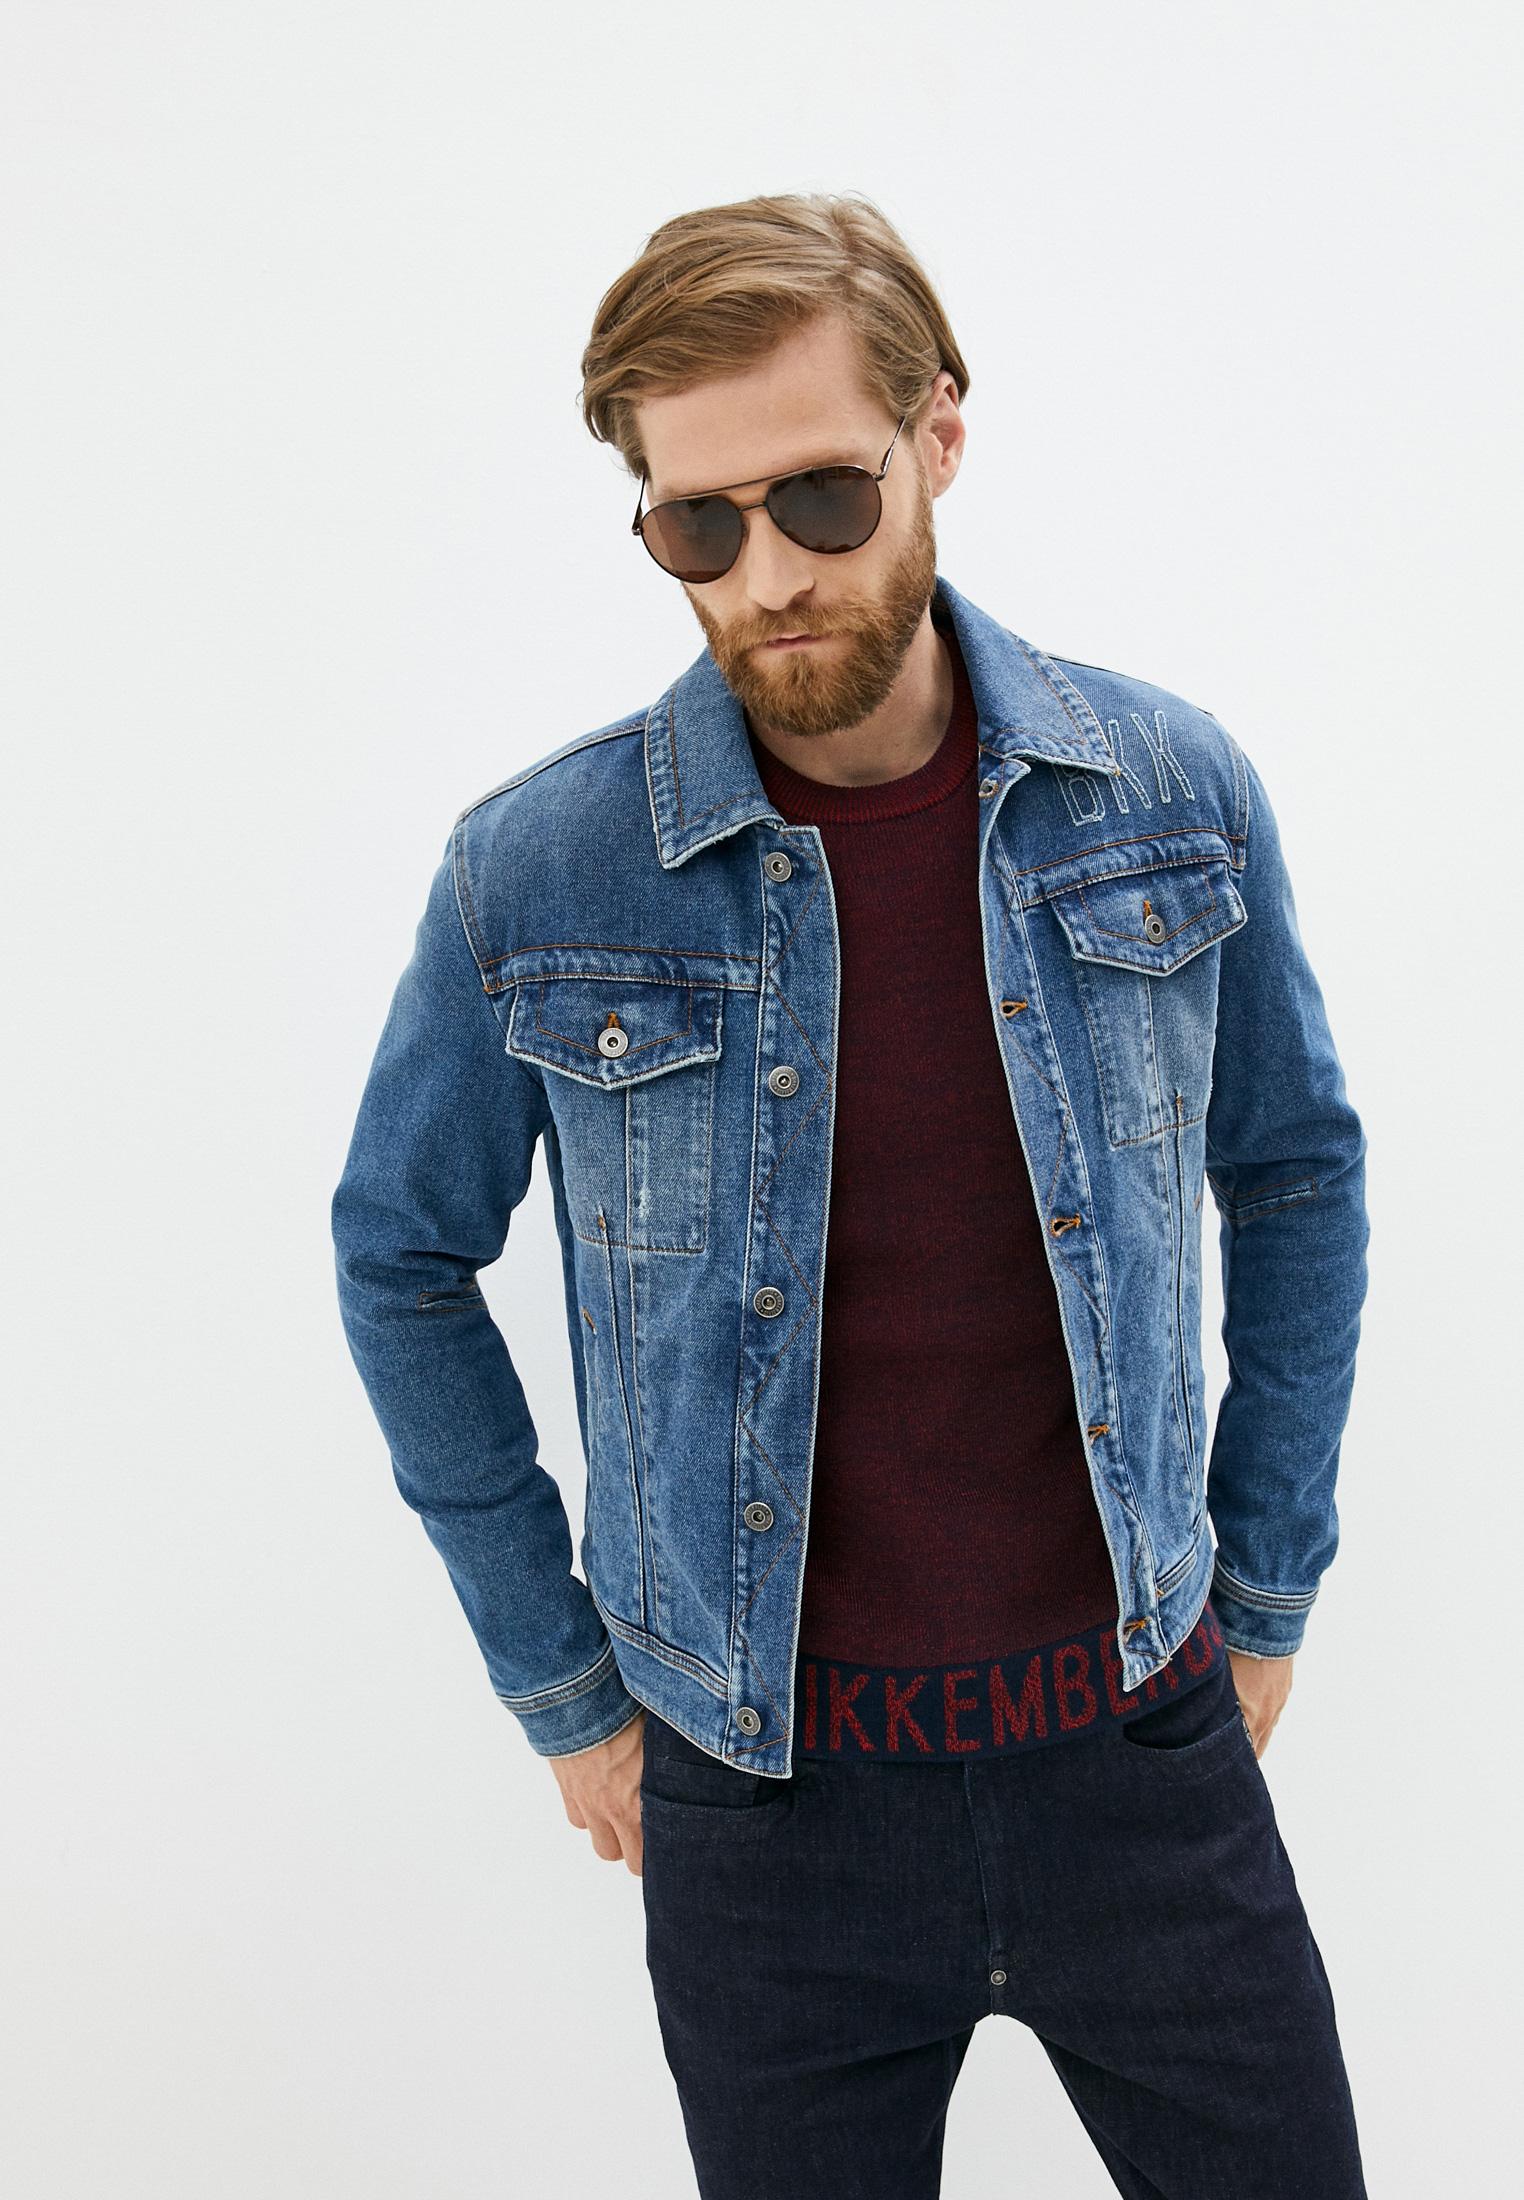 Джинсовая куртка Bikkembergs Куртка джинсовая Bikkembergs